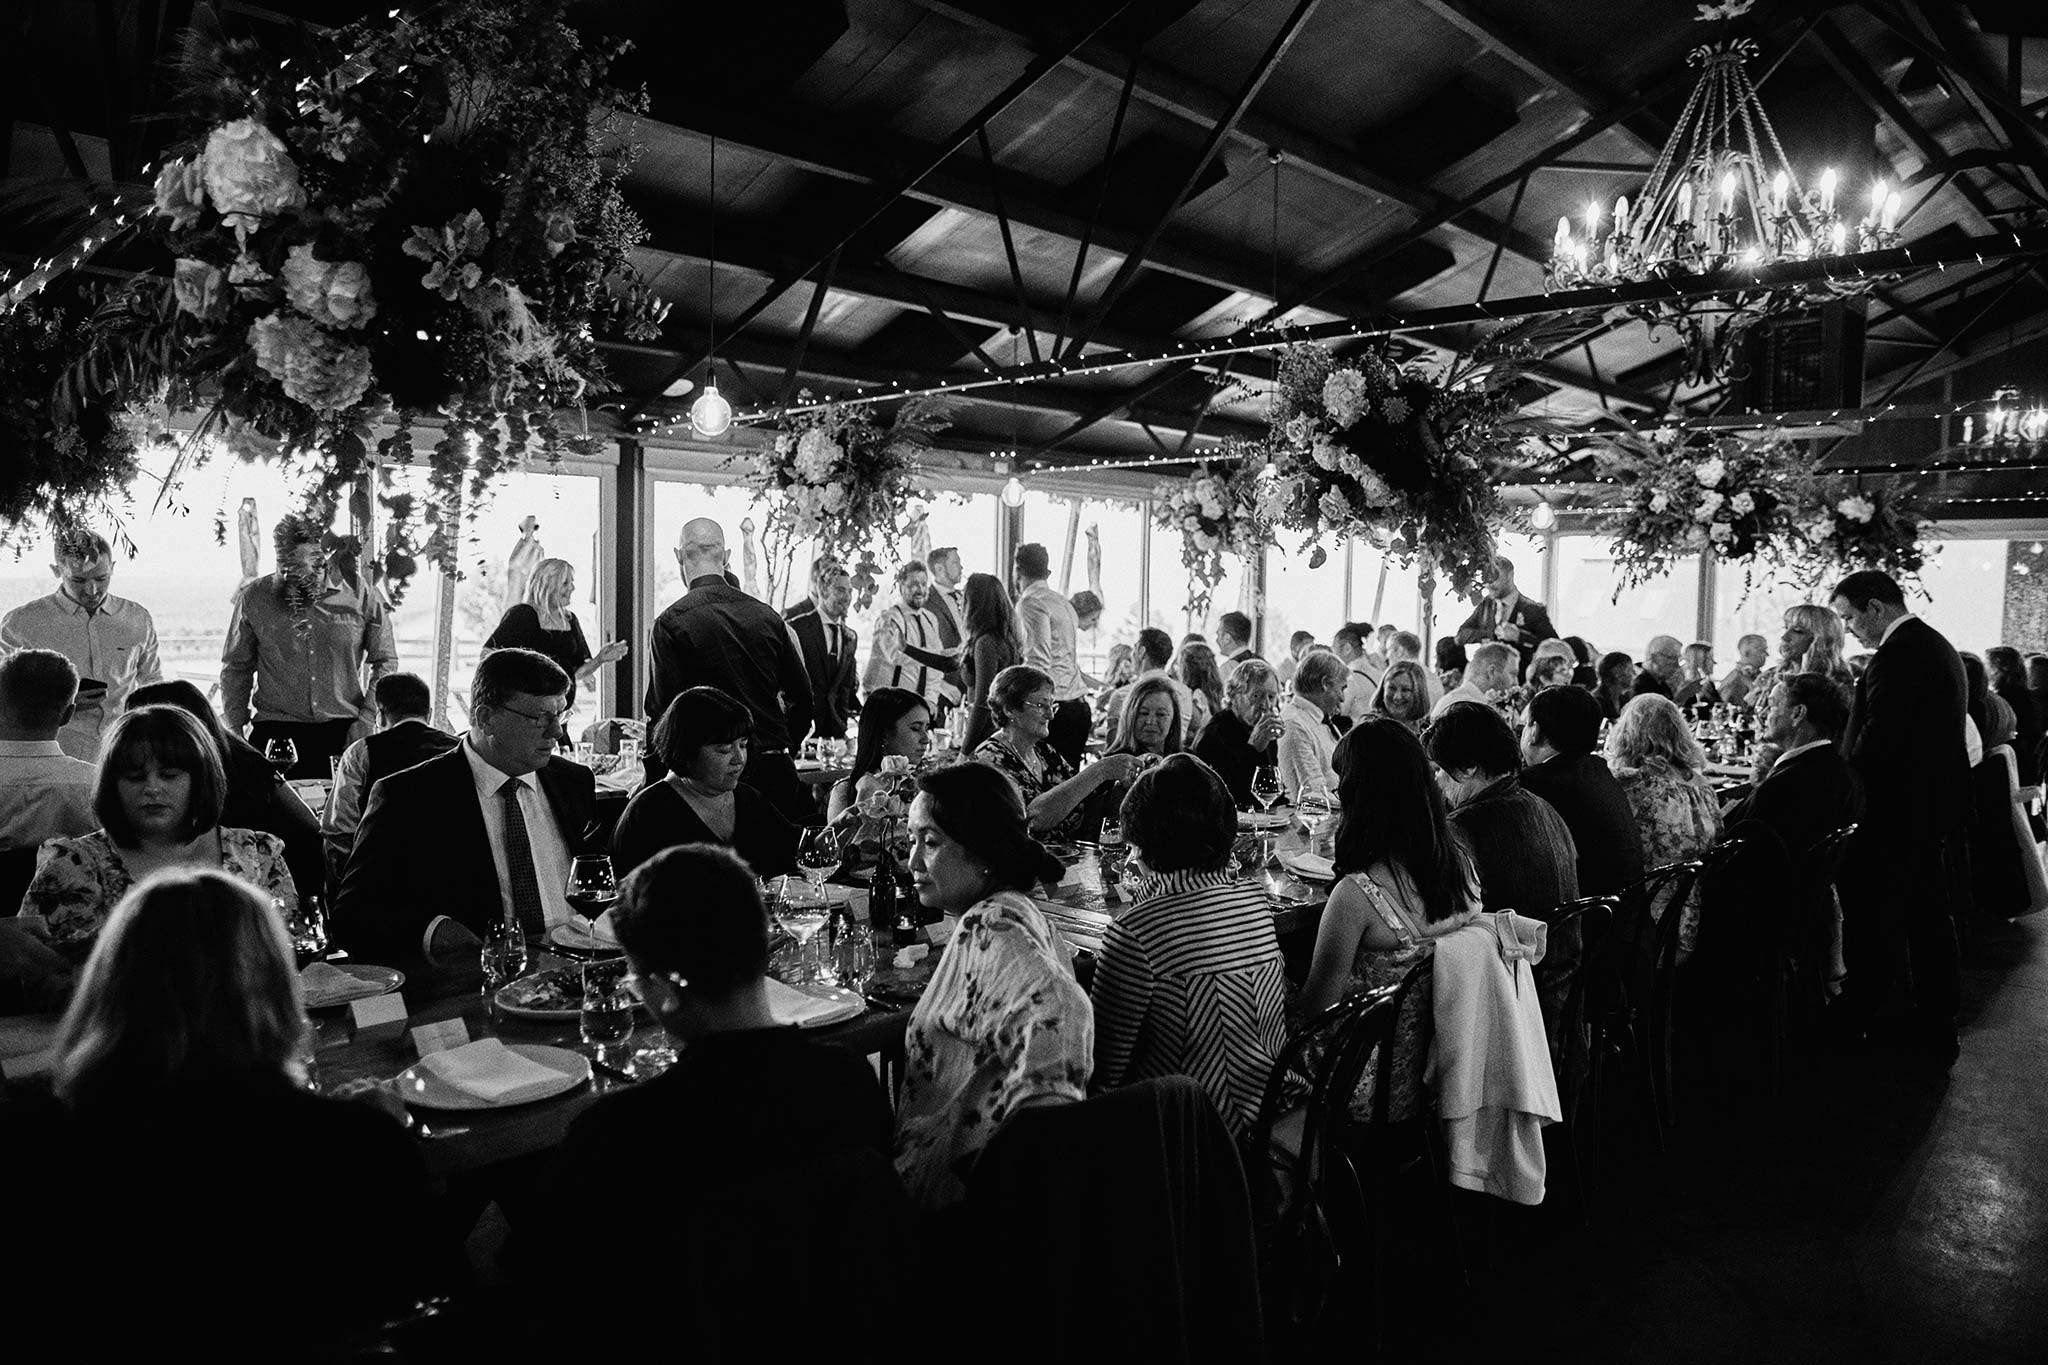 Zonzo estate wedding reception interior